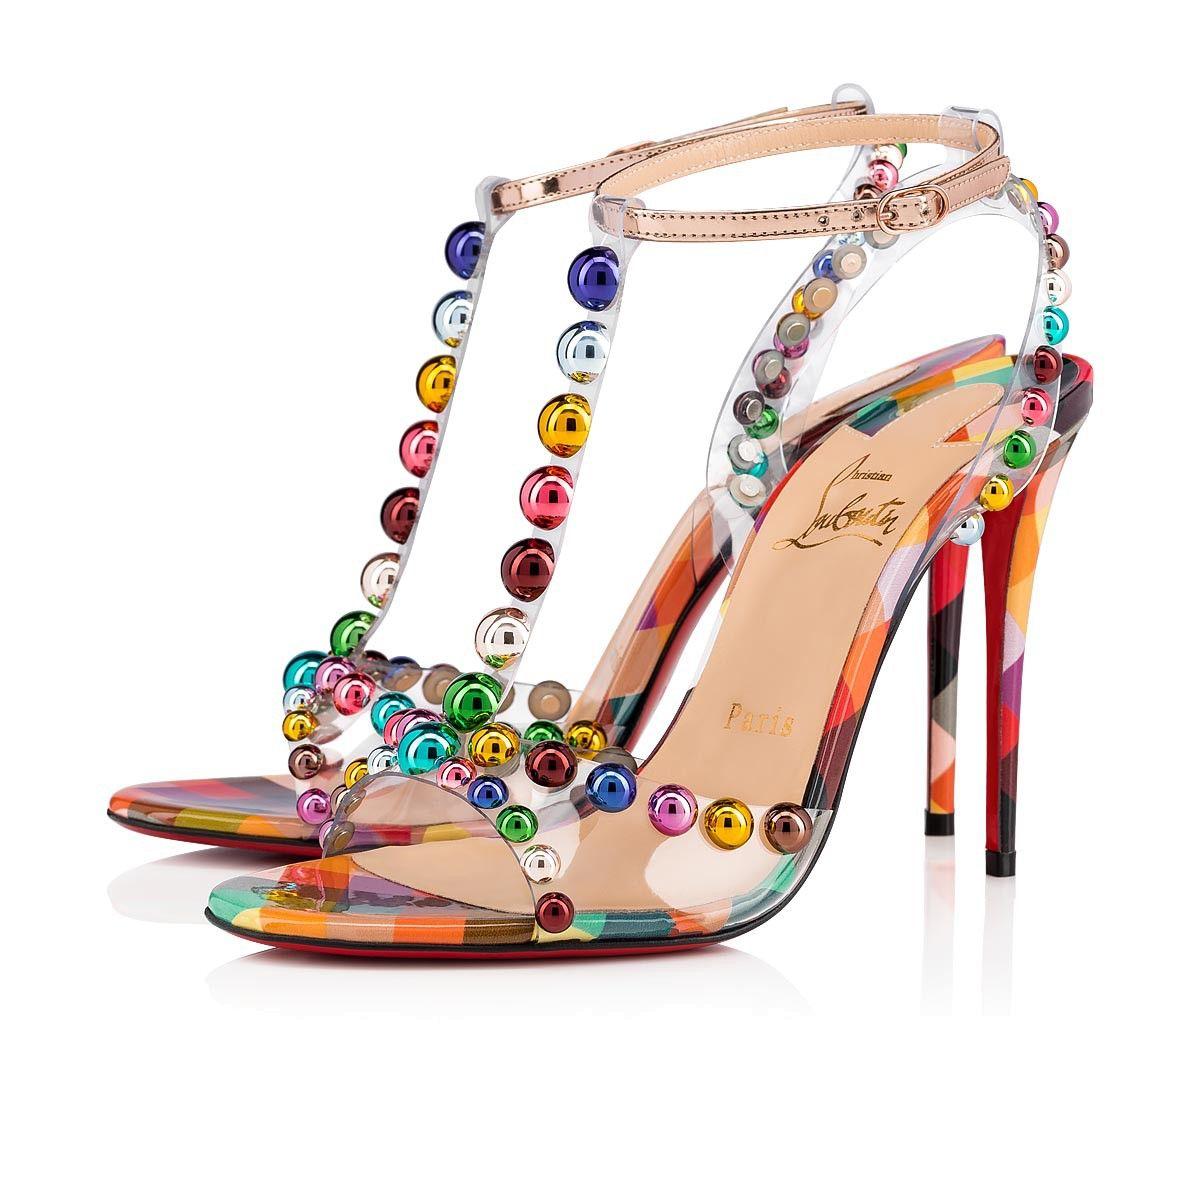 0ccfce5b3 Faridaravie 100 Version Multi Patent Cinestripes - Women Shoes - Christian  Louboutin